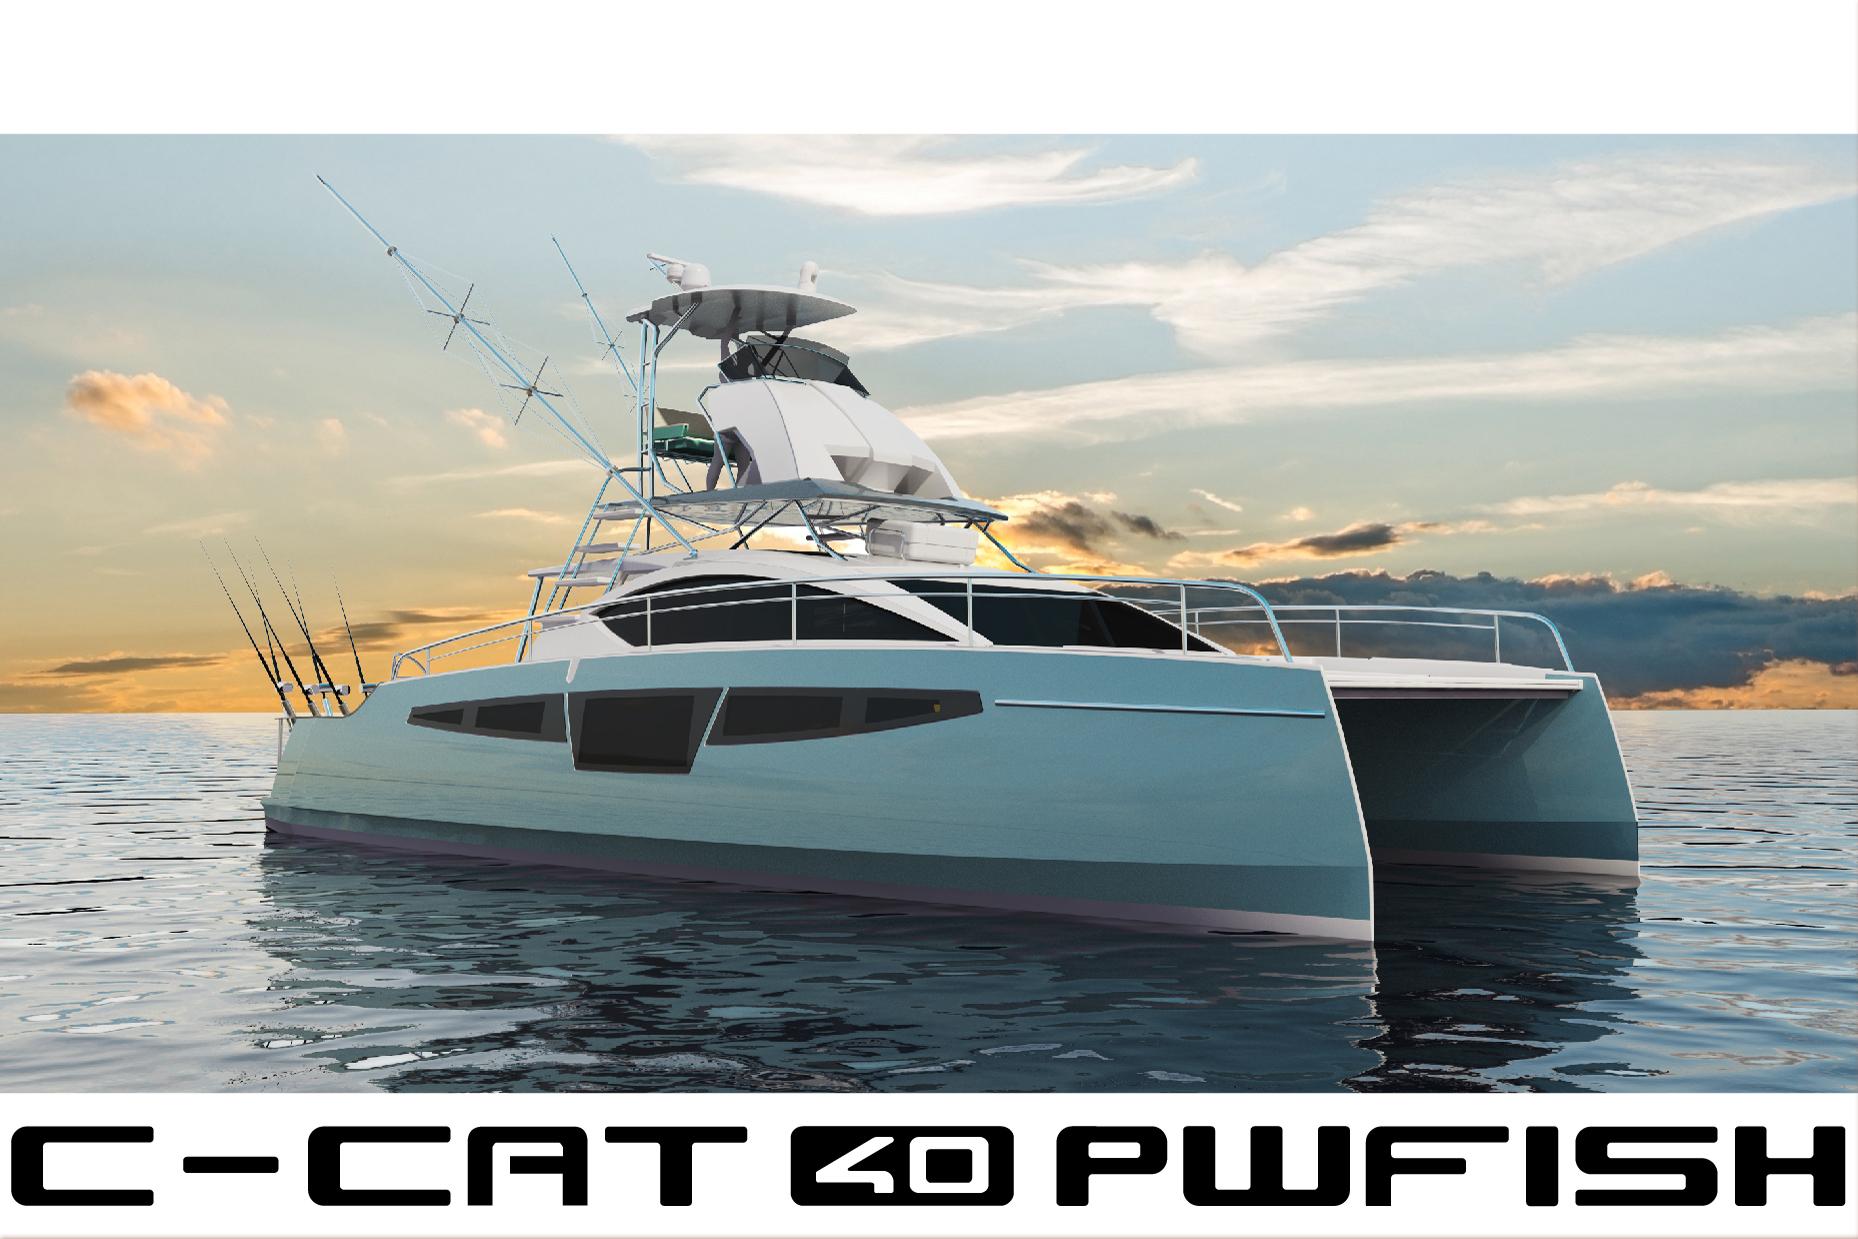 box-home-c-cat-38pwfish-900-x-600